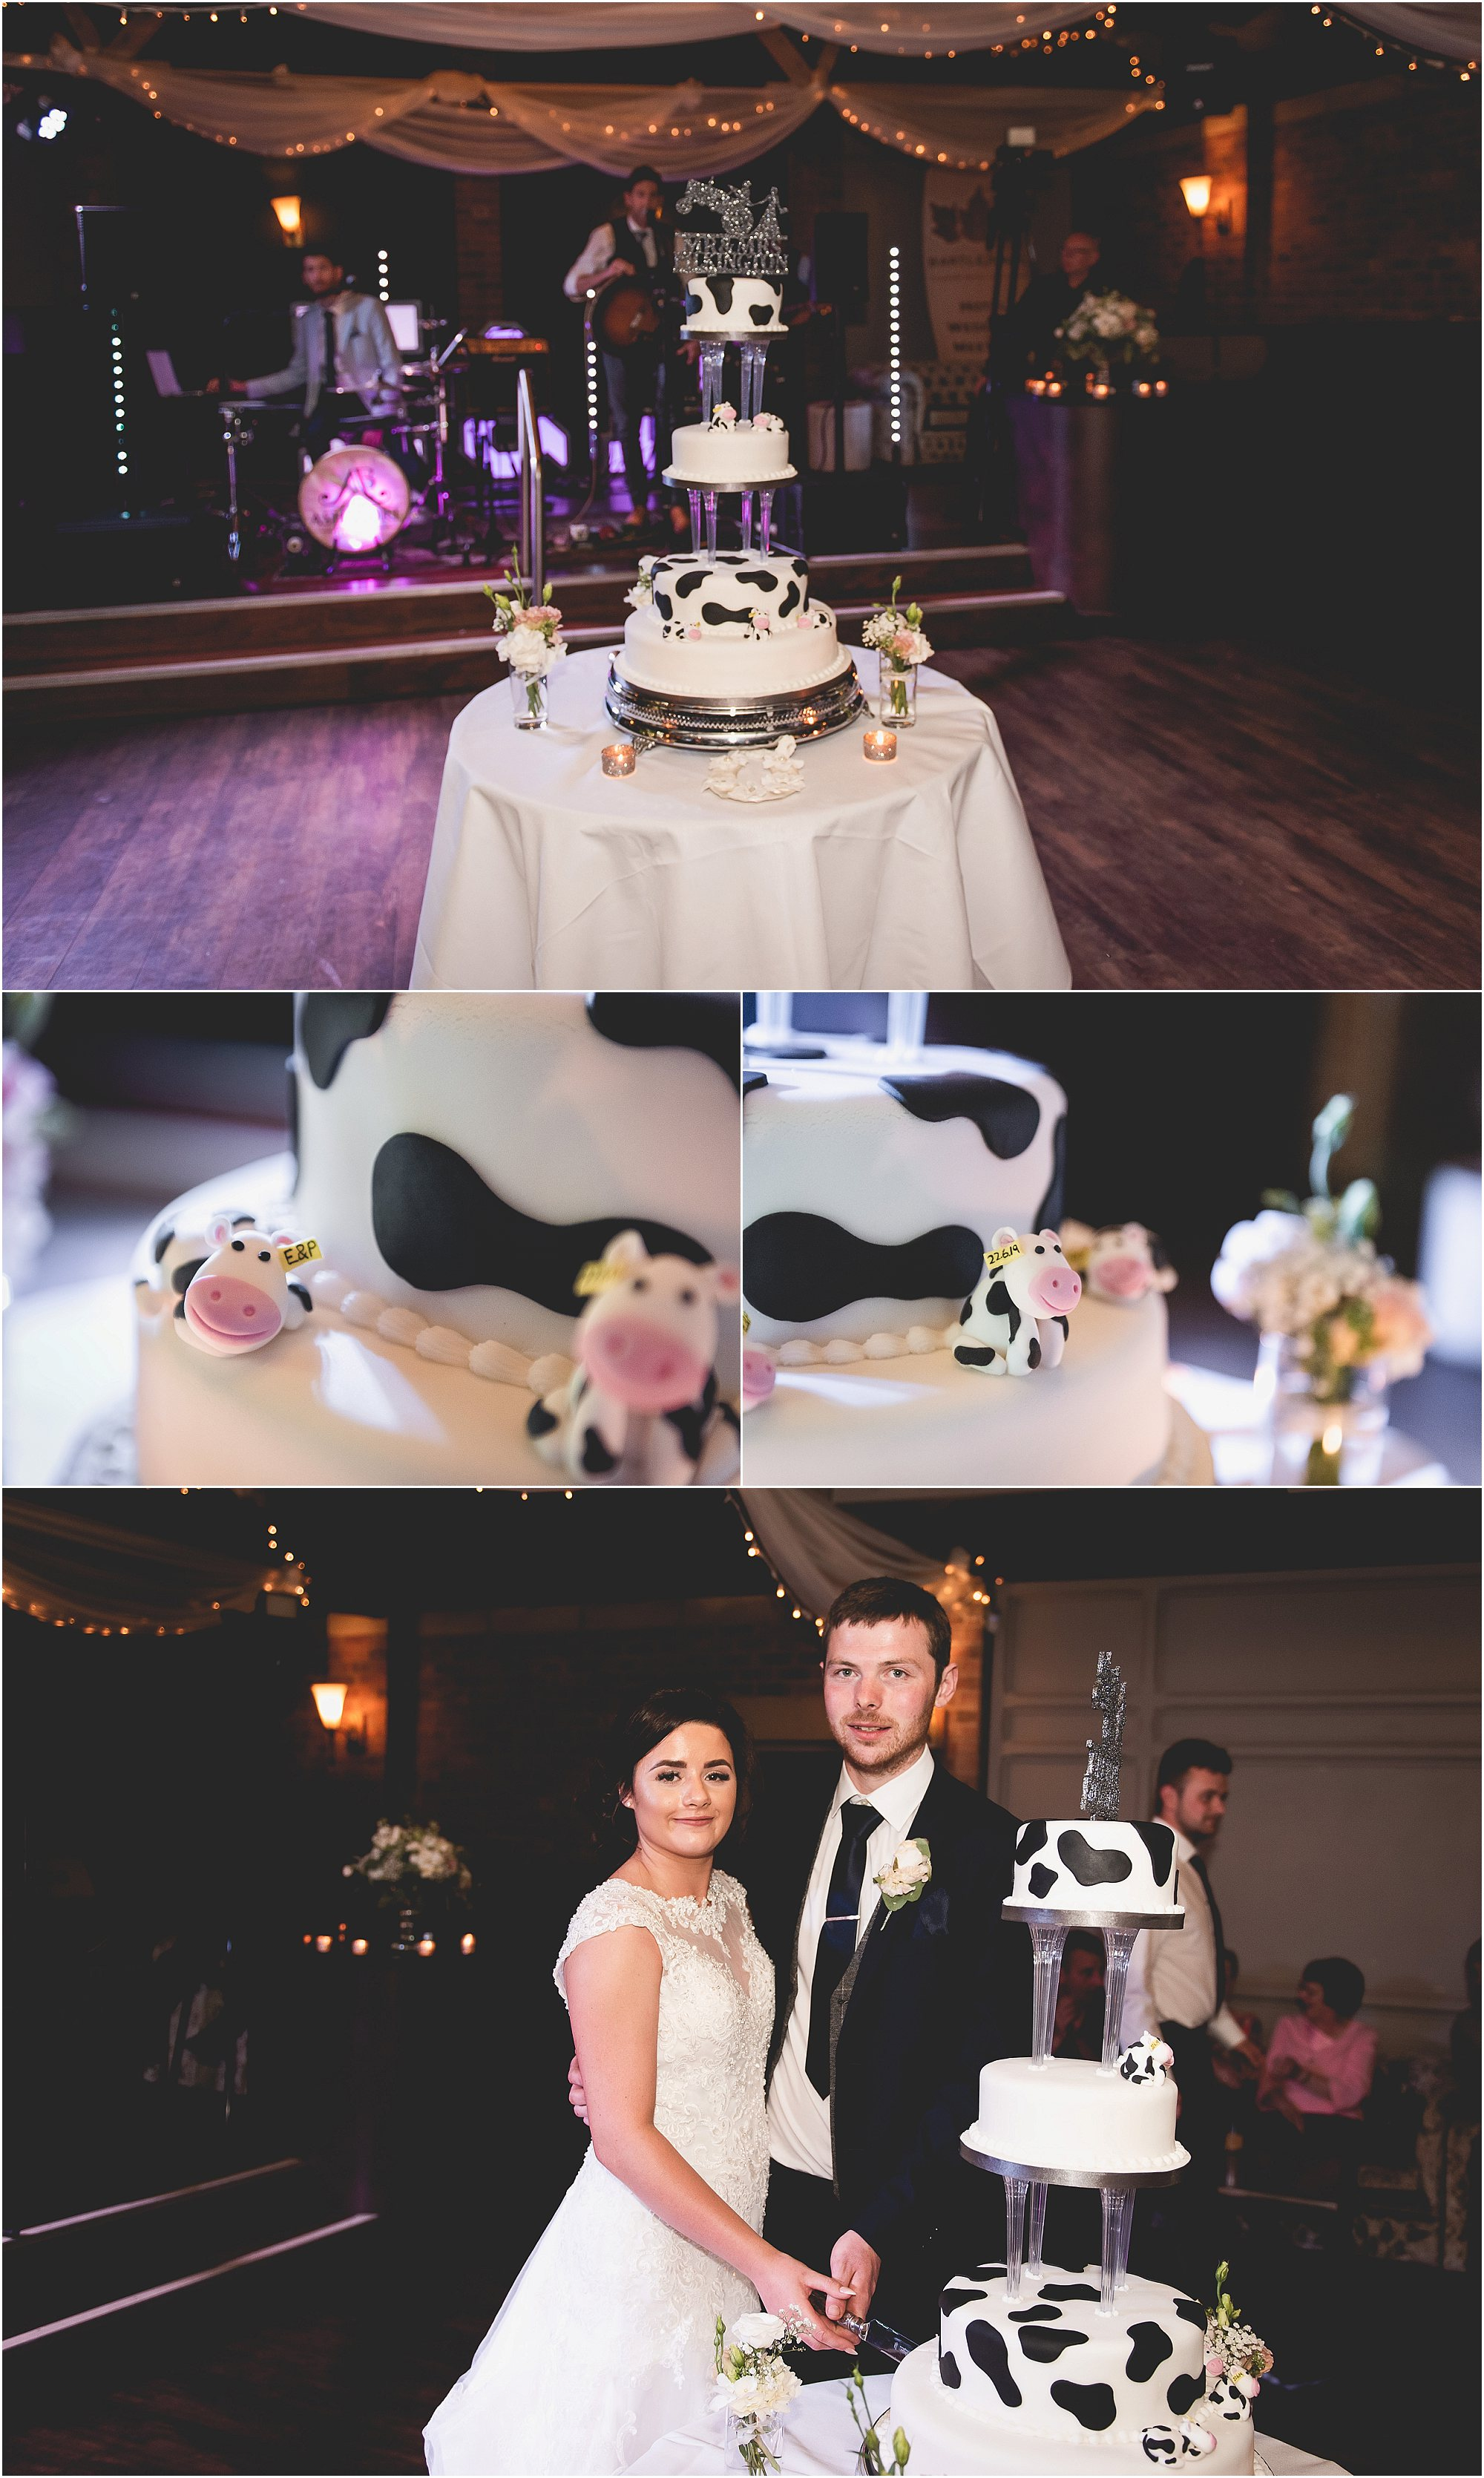 Dairy farm themed Wedding Cake